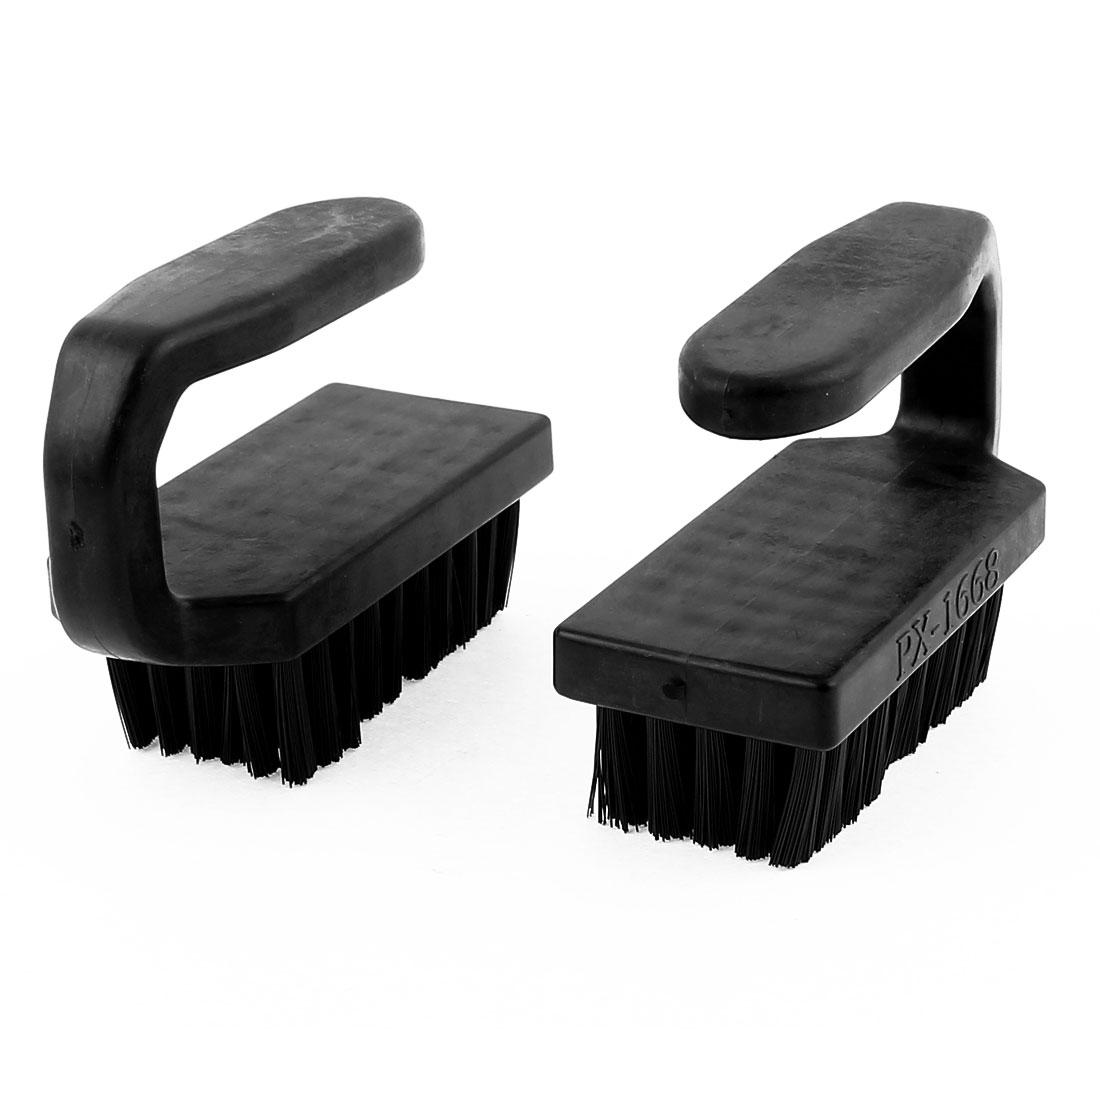 2 Pcs 95 x 70 x 40mm Black U Shape Plastic Handle PCB Circuit Board Anti Static Brush